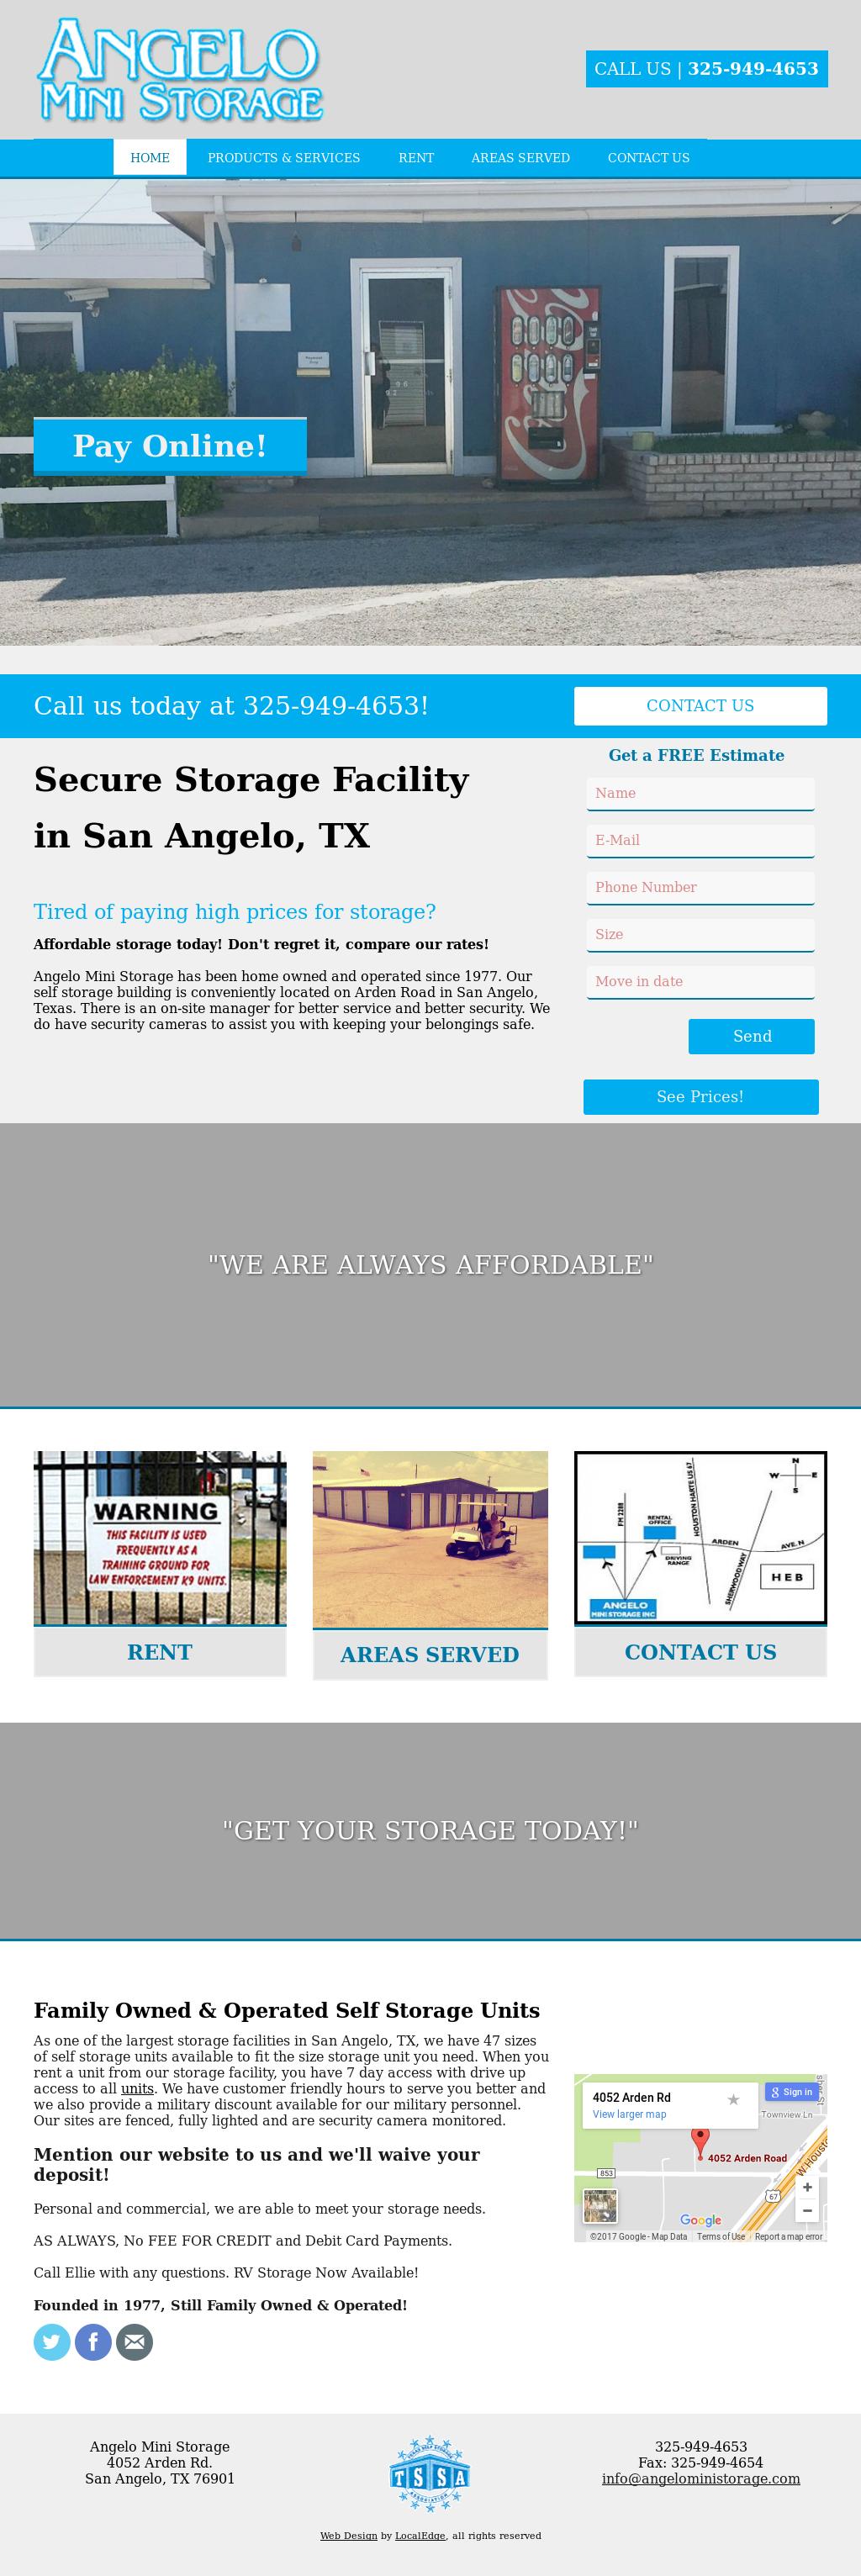 Angelo Mini Storage Website History